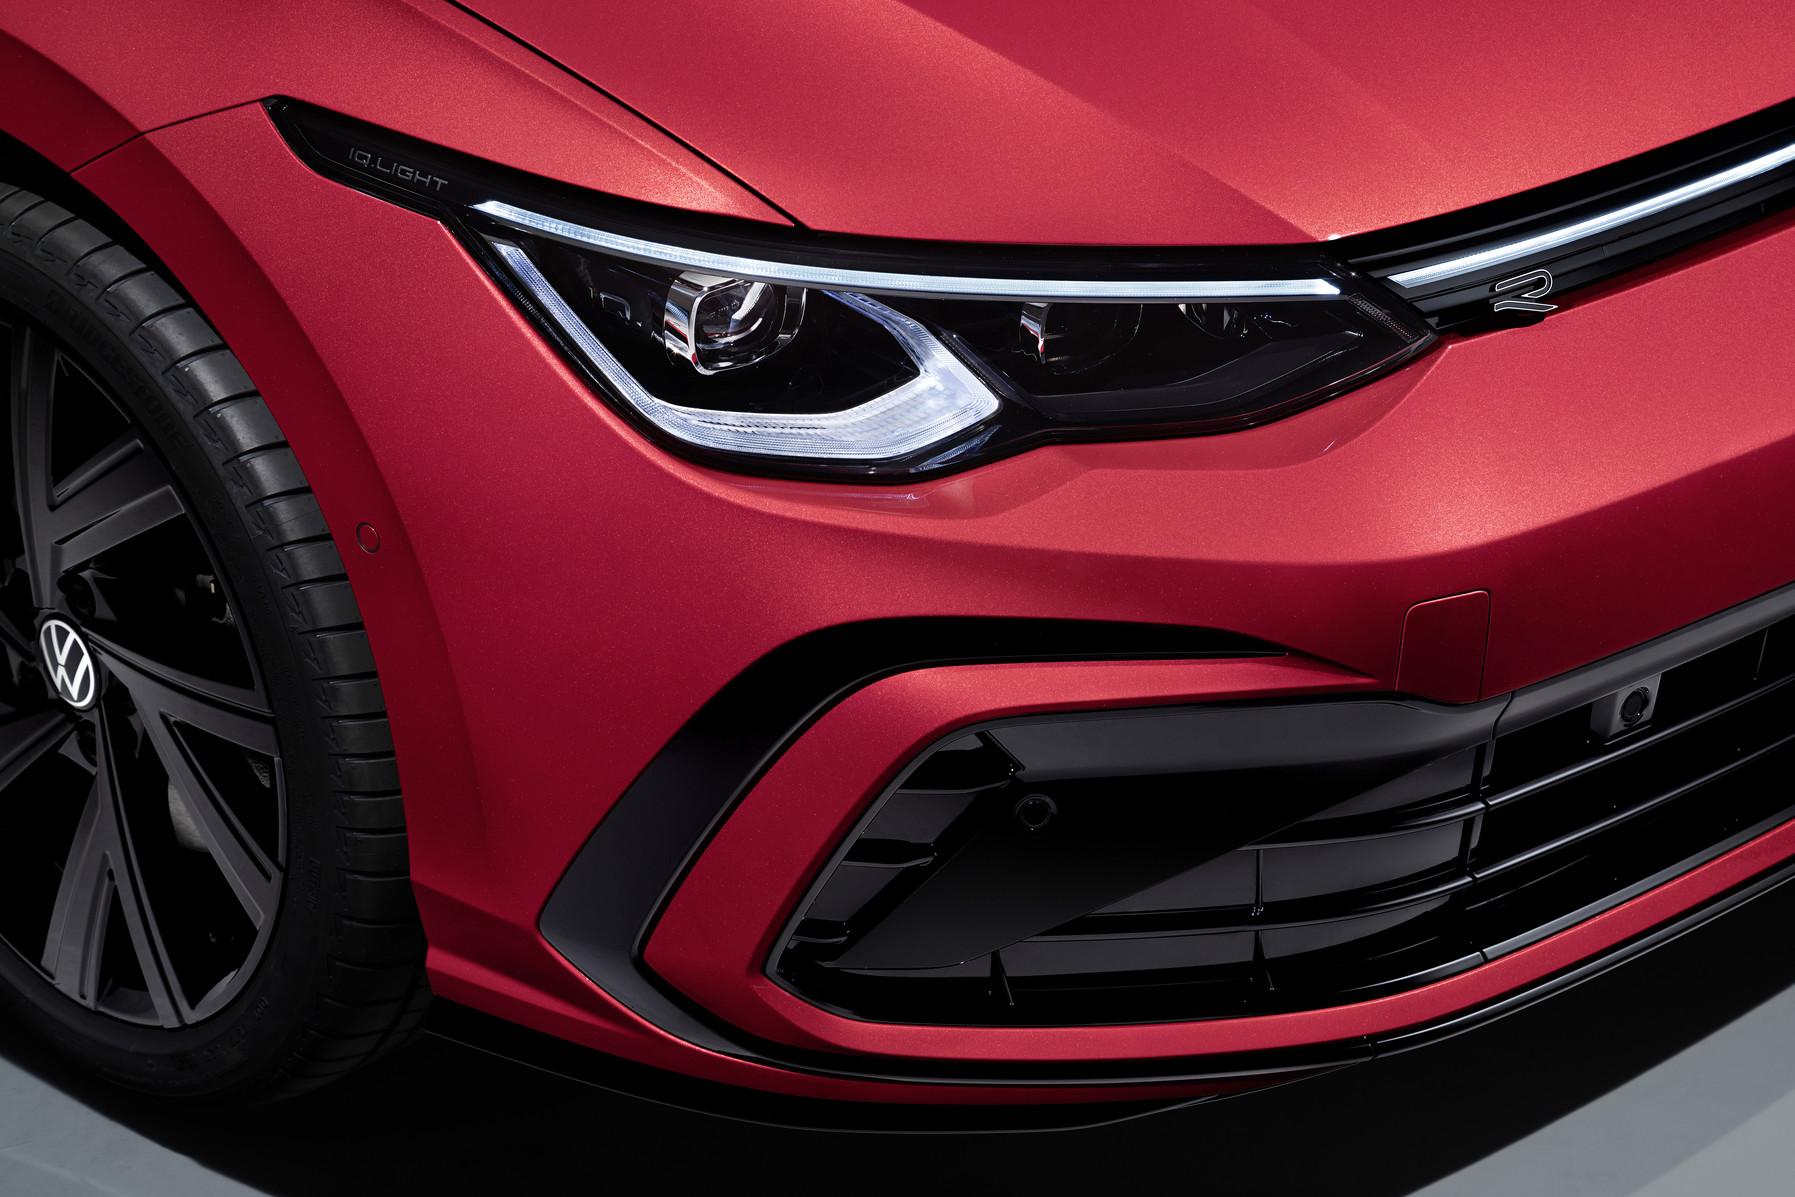 Fari matrix led di nuova Volkswagen Golf Variant